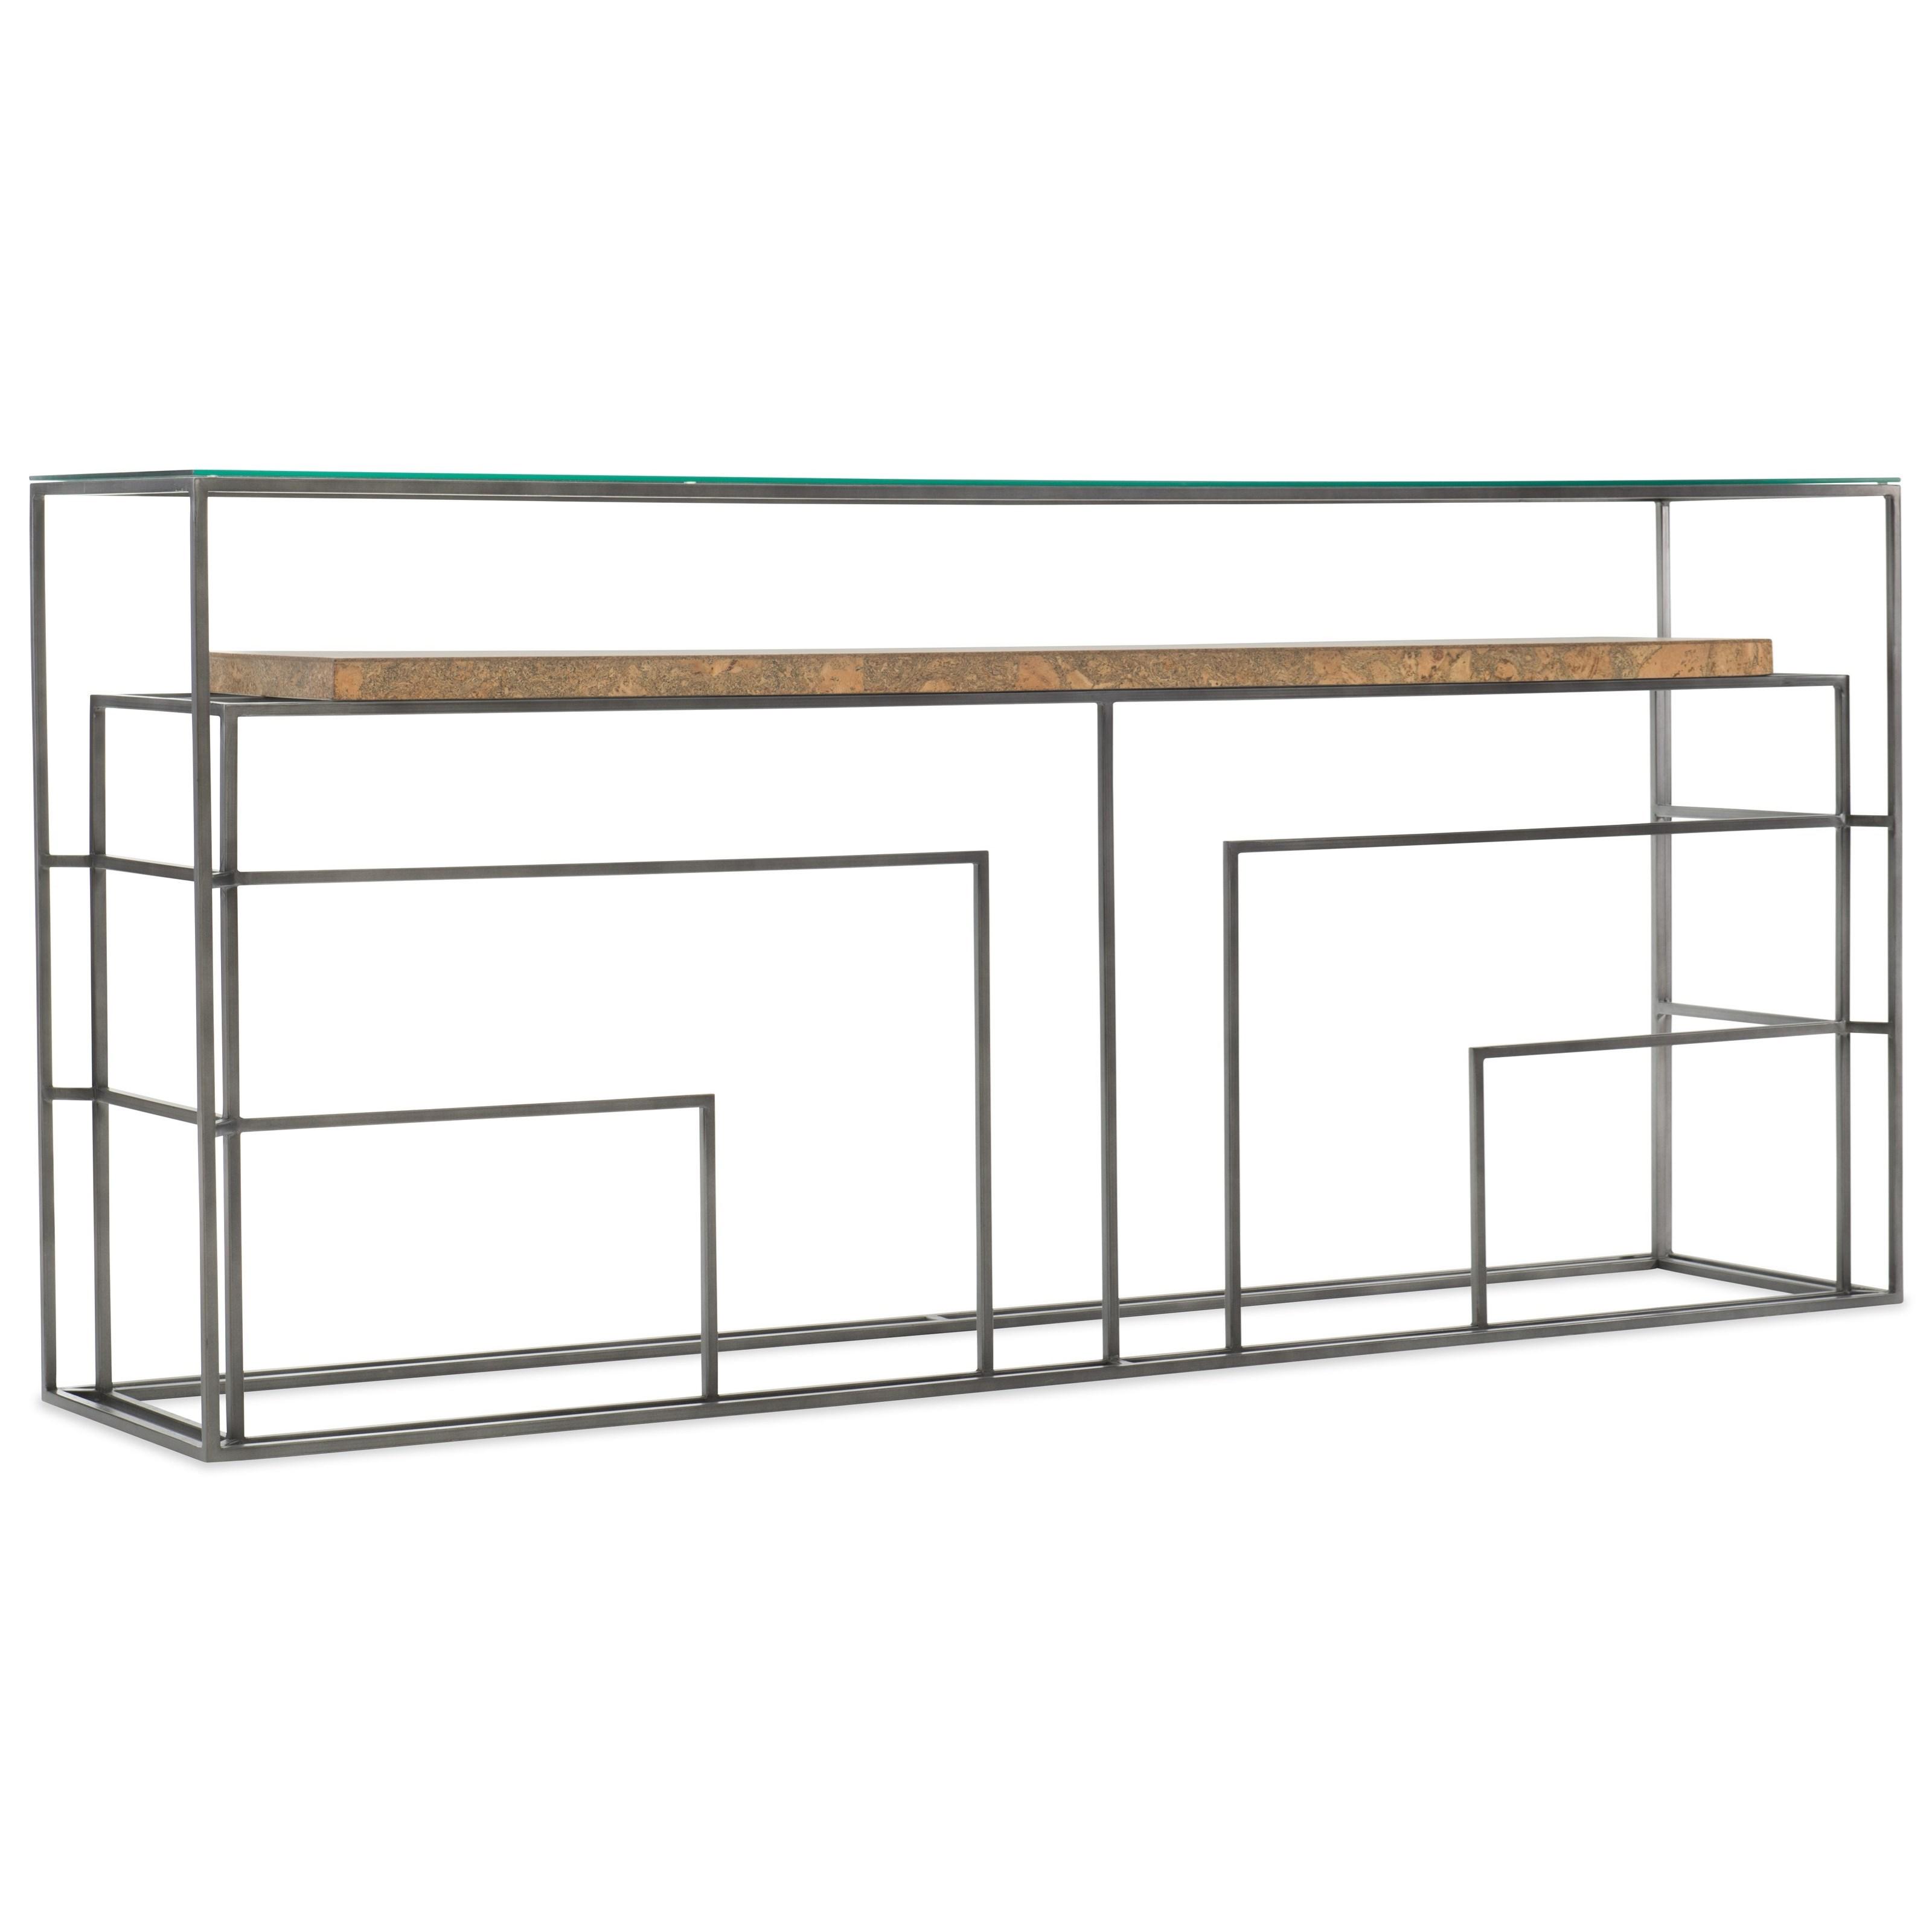 Contemporary Sofa Table with Cork Shelf